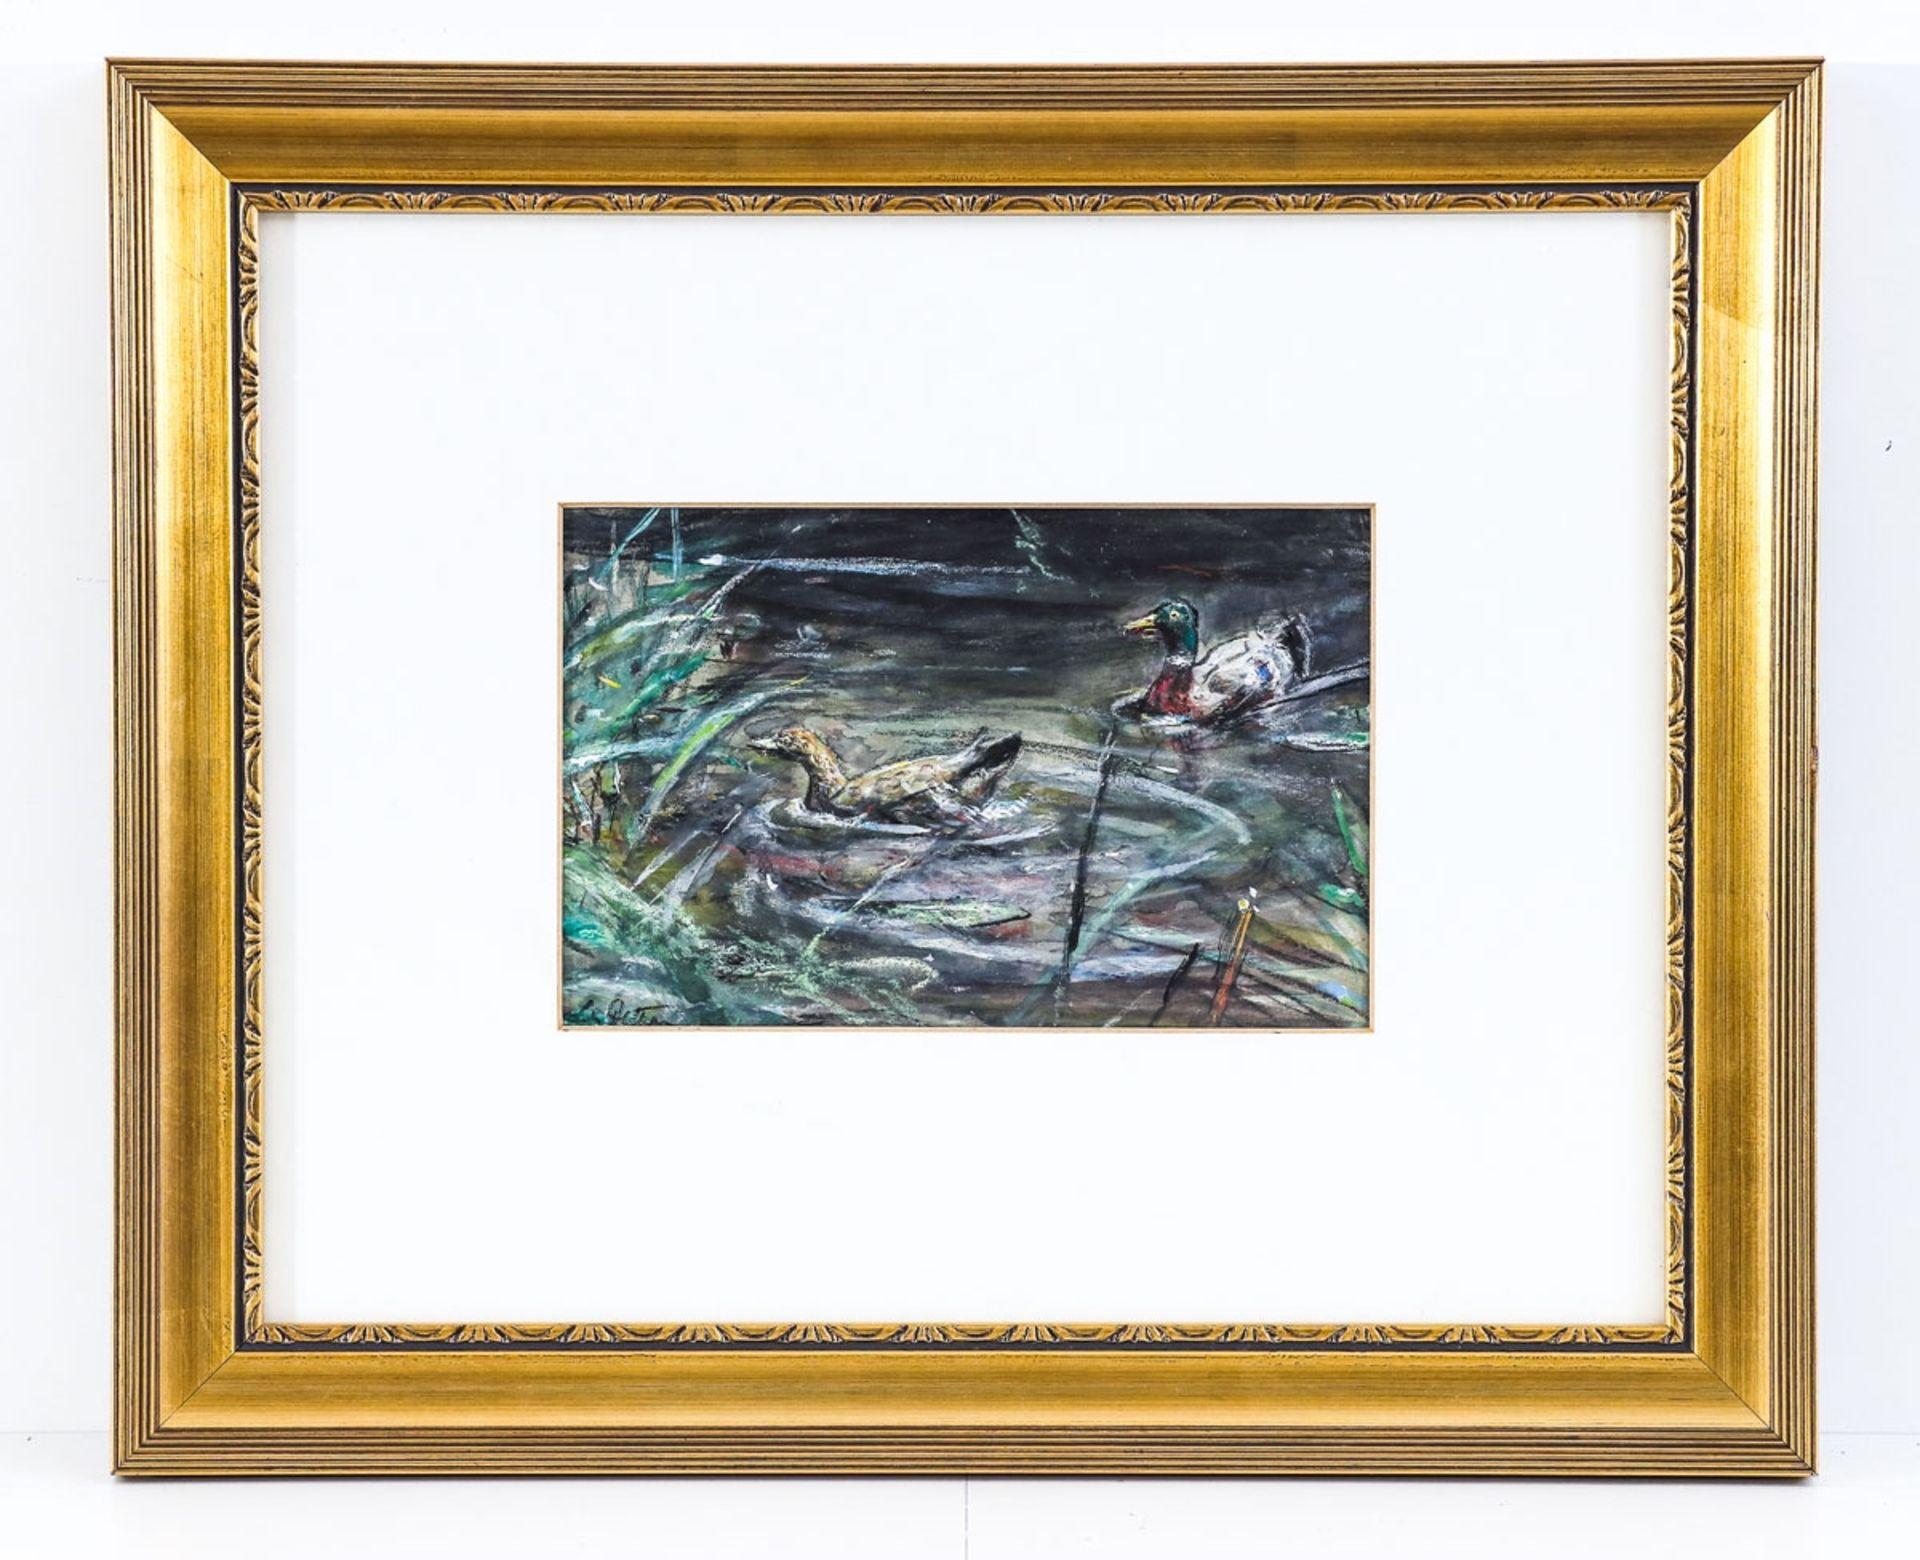 Ludwig Dettmann - Bild 2 aus 2